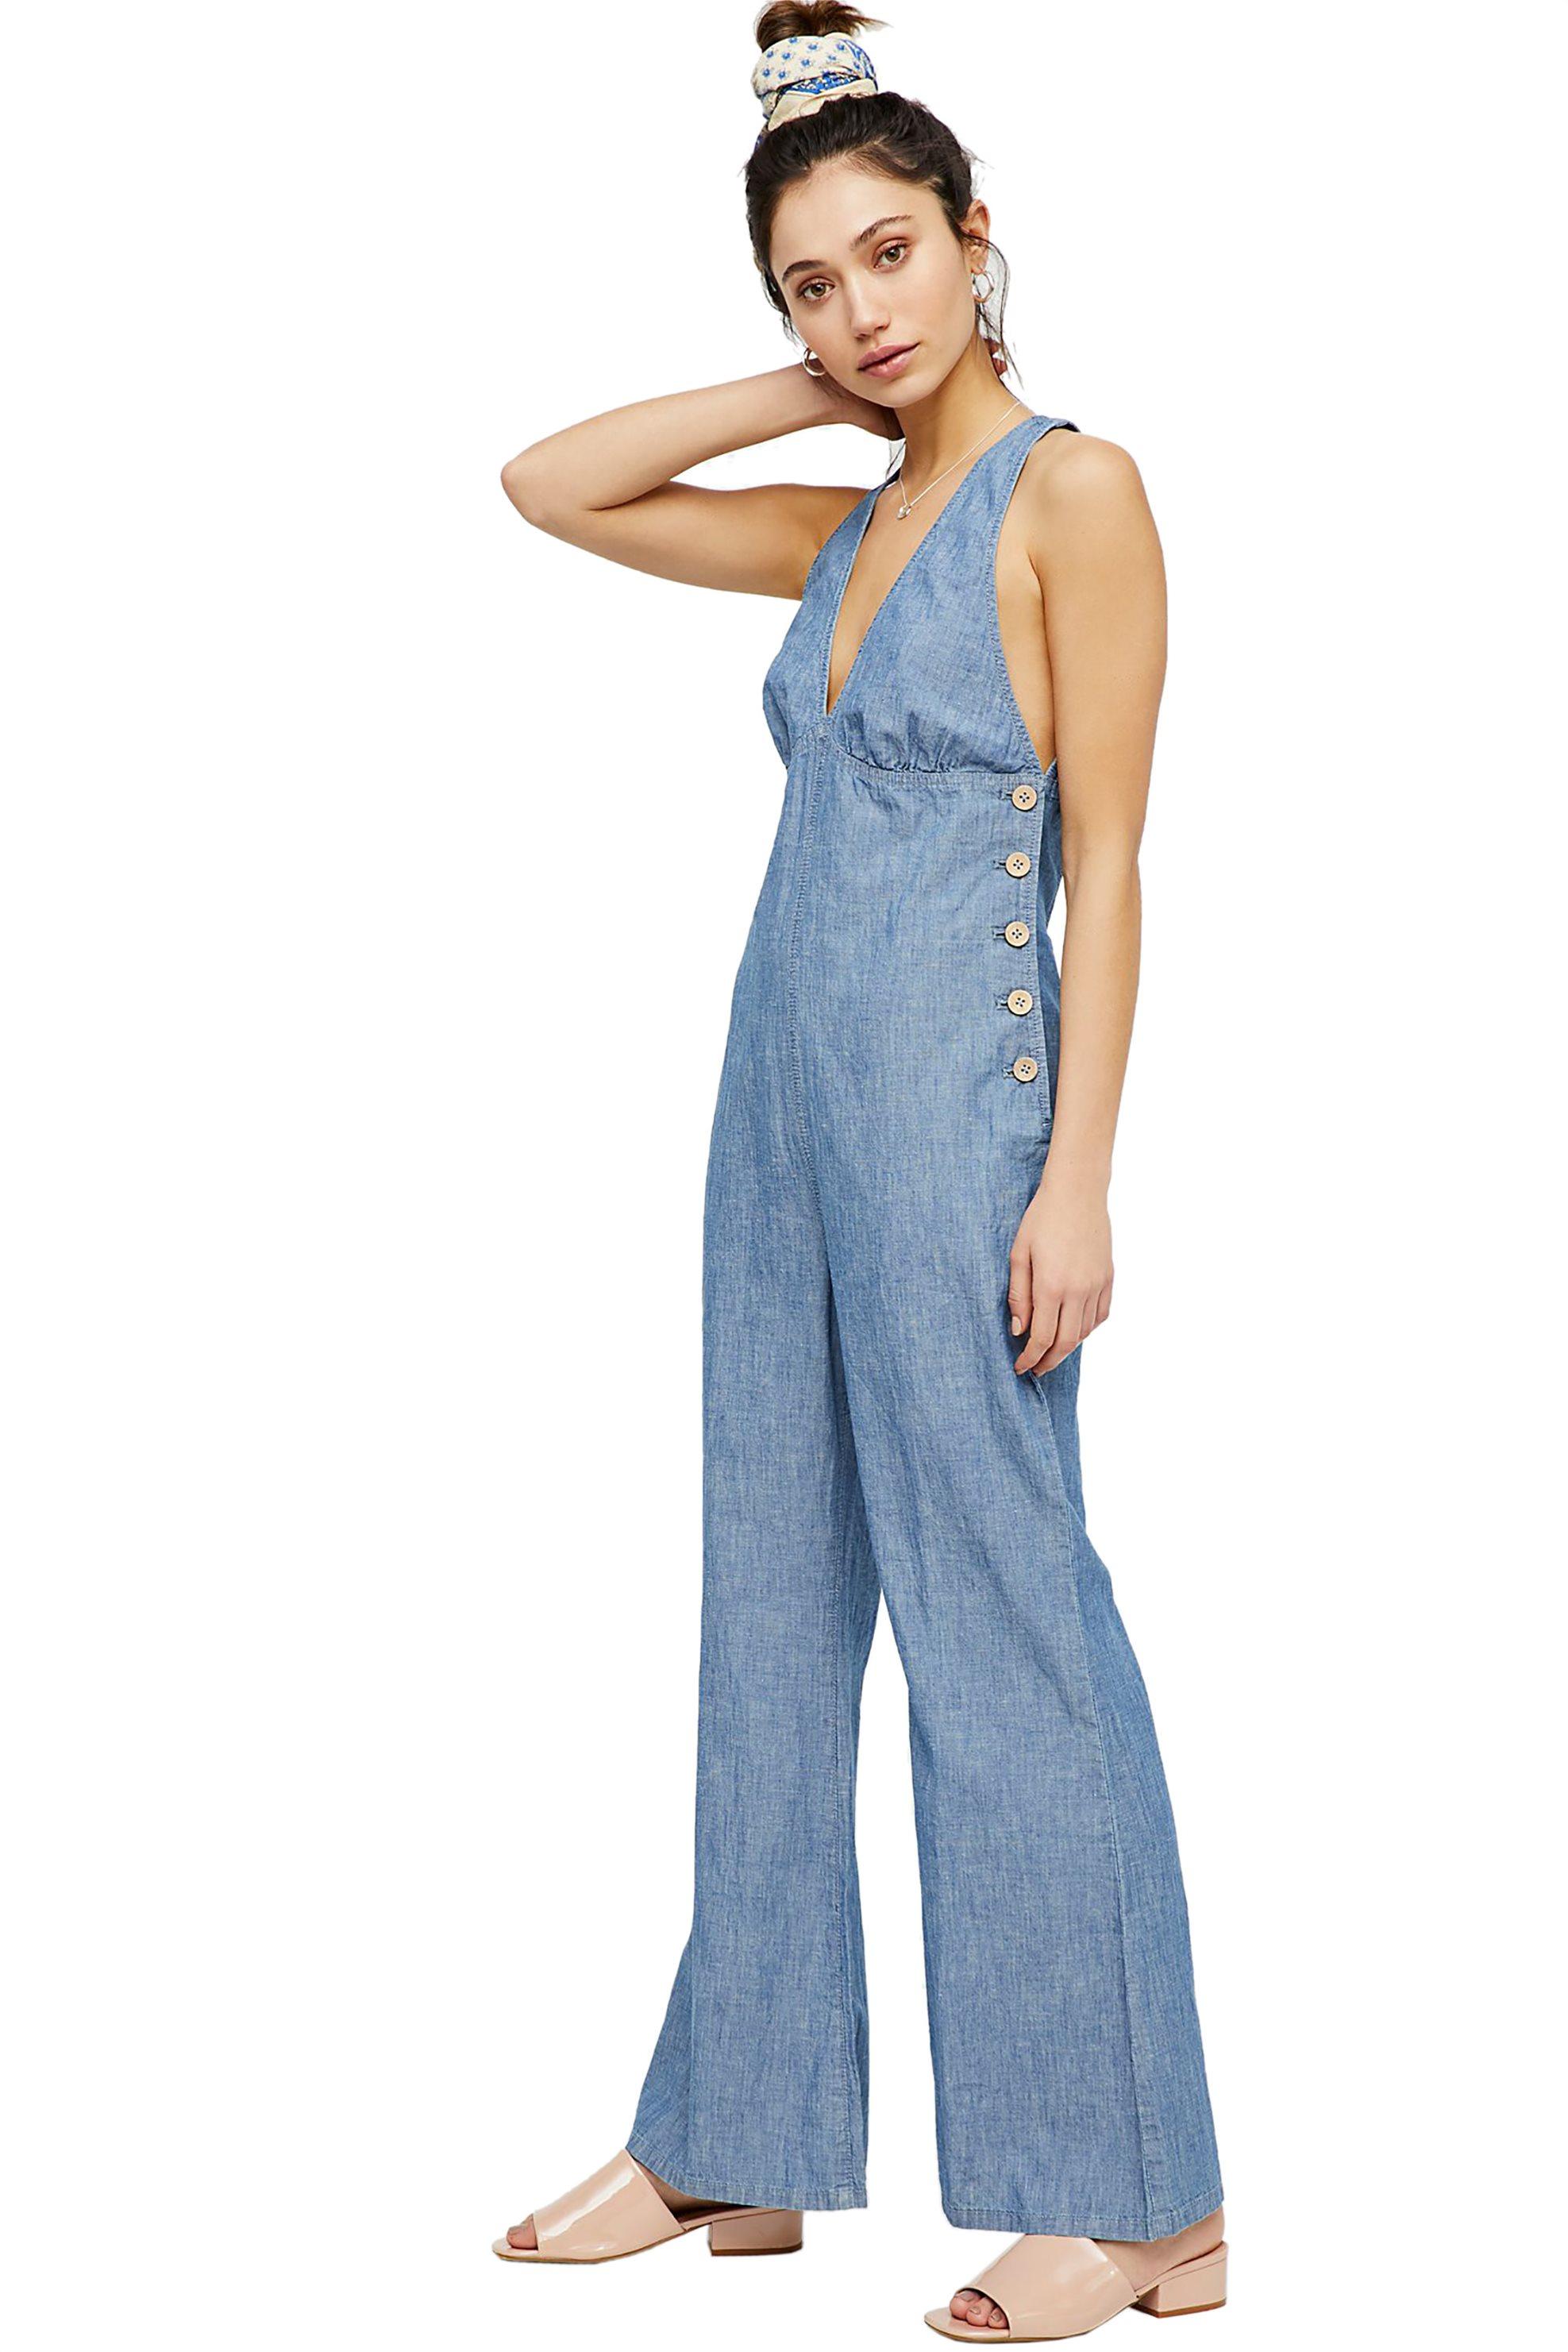 Free People γυναικεία ολόσωμη φόρμα Dance All Night One-Piece - OB776374 - Γαλάζ γυναικα   ρουχα   ολόσωμες φόρμες   σαλοπέτες